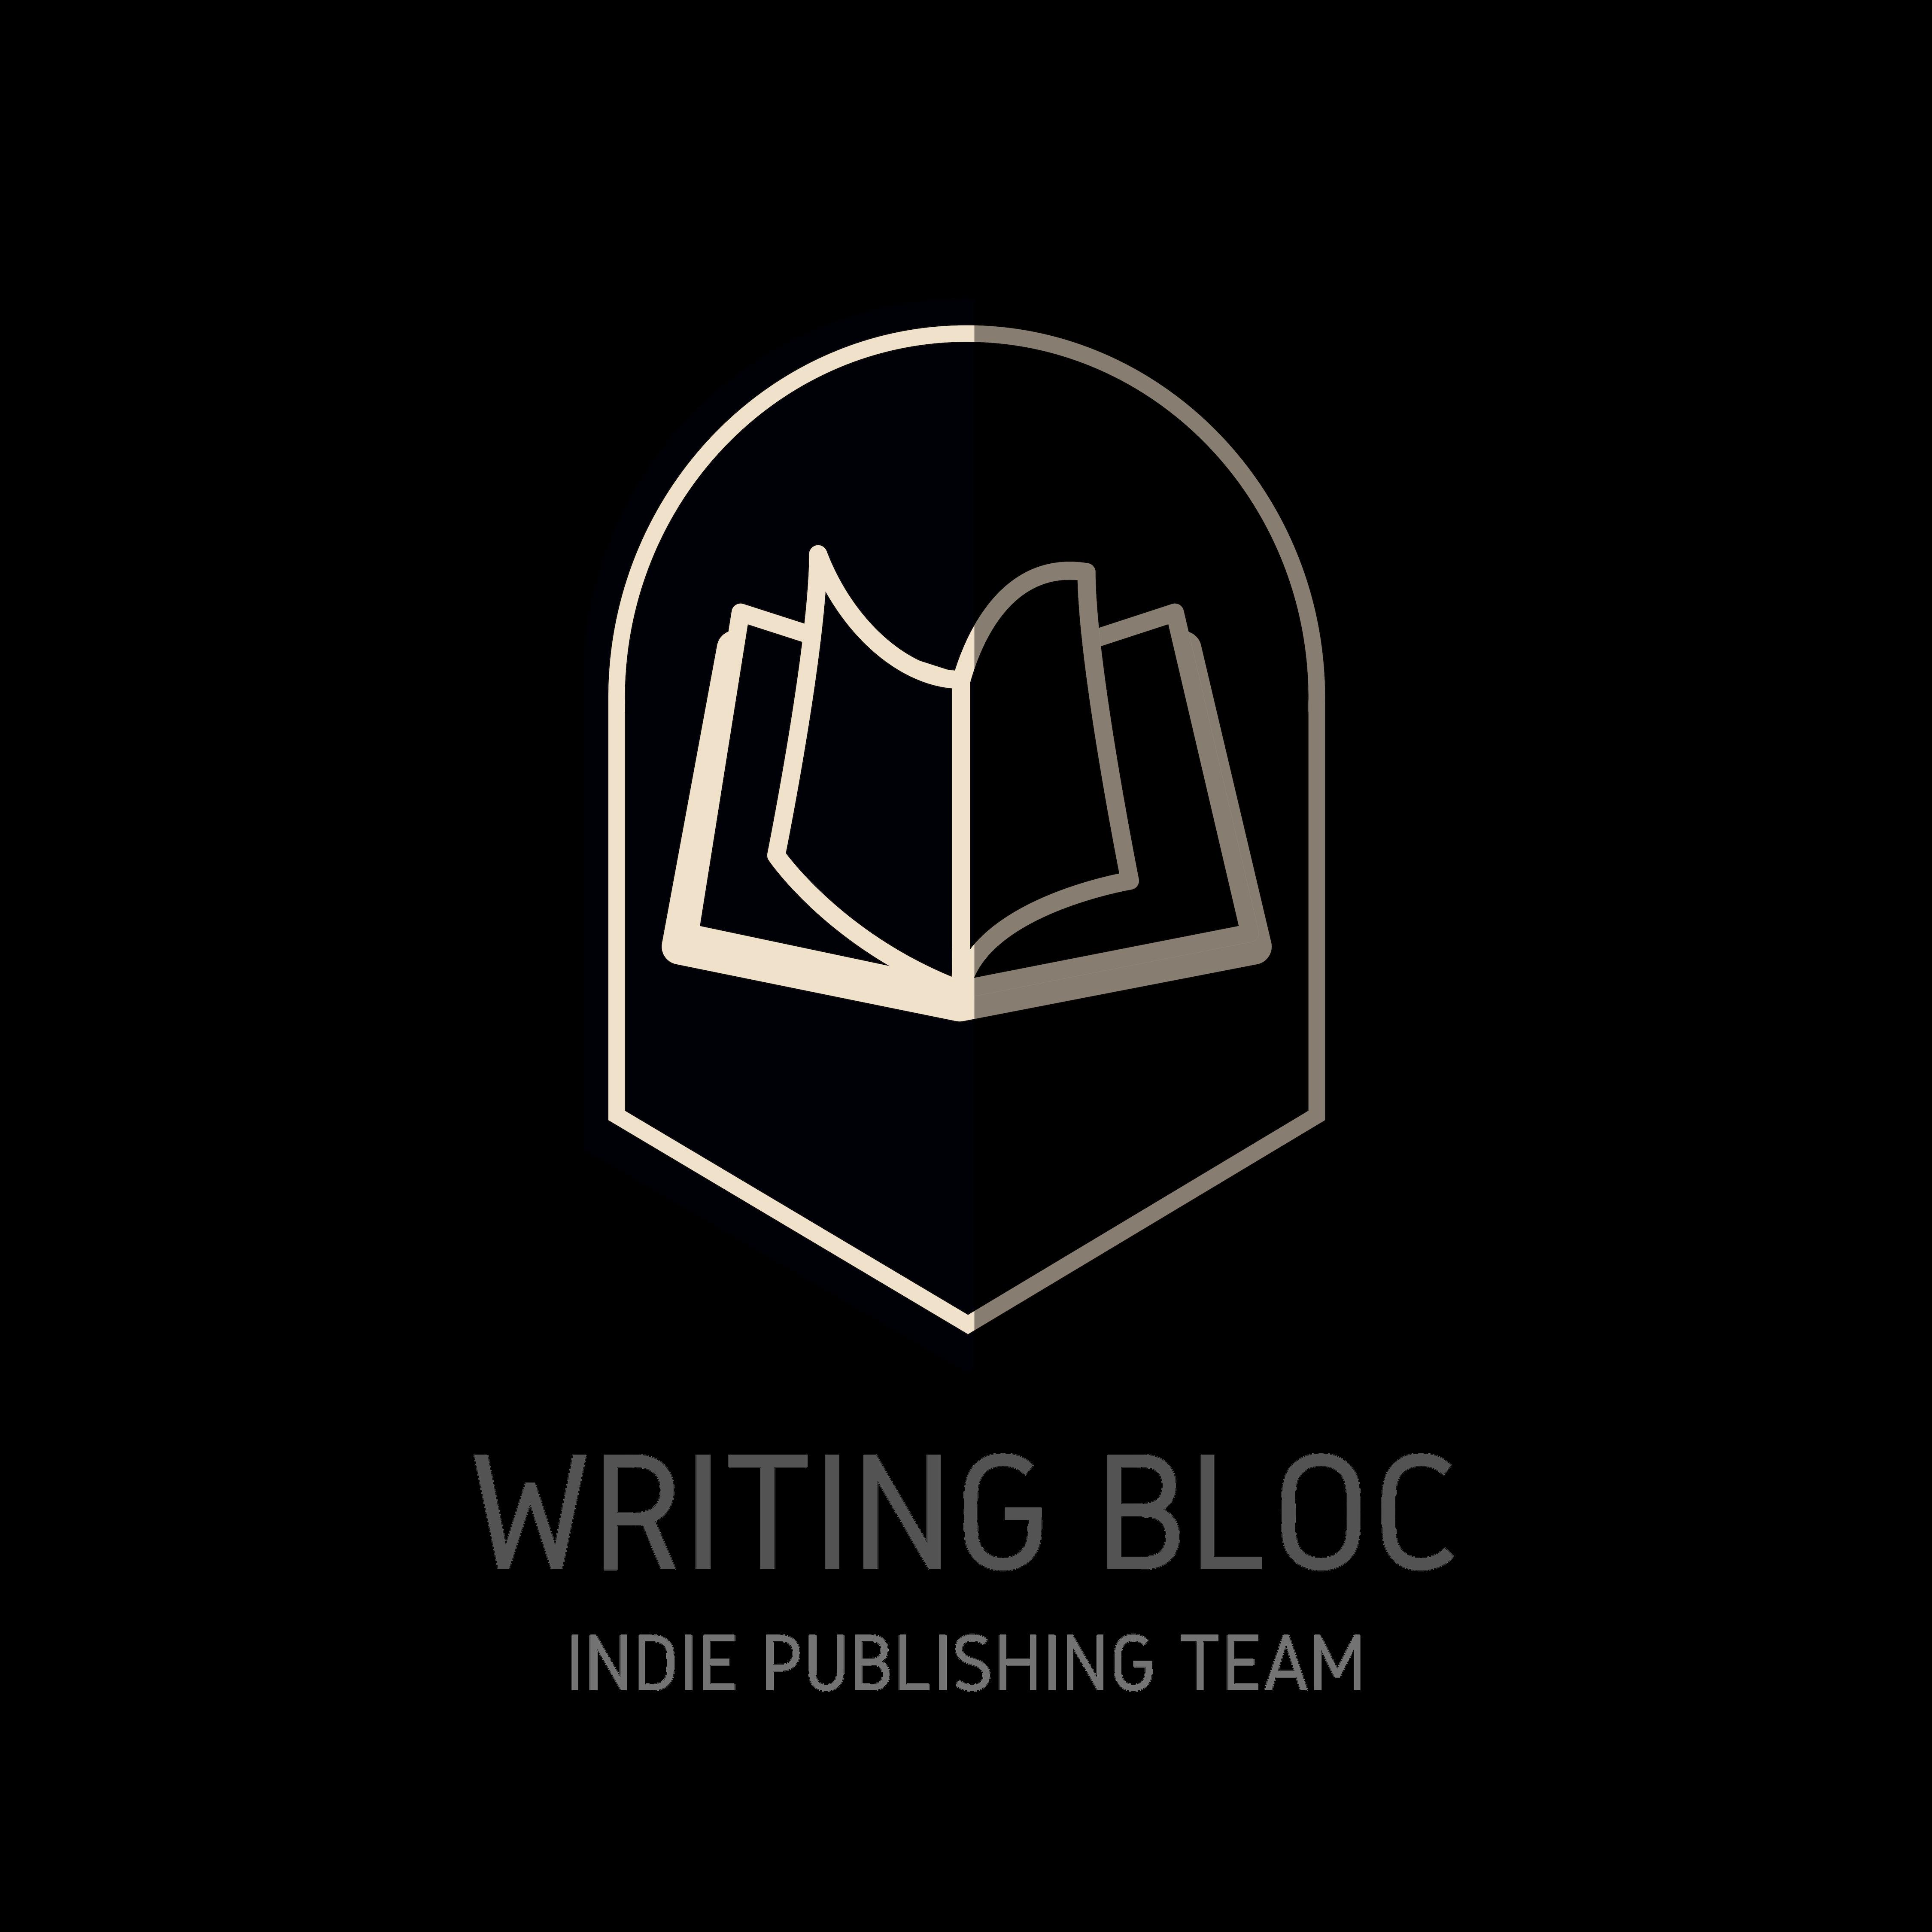 Writing Bloc